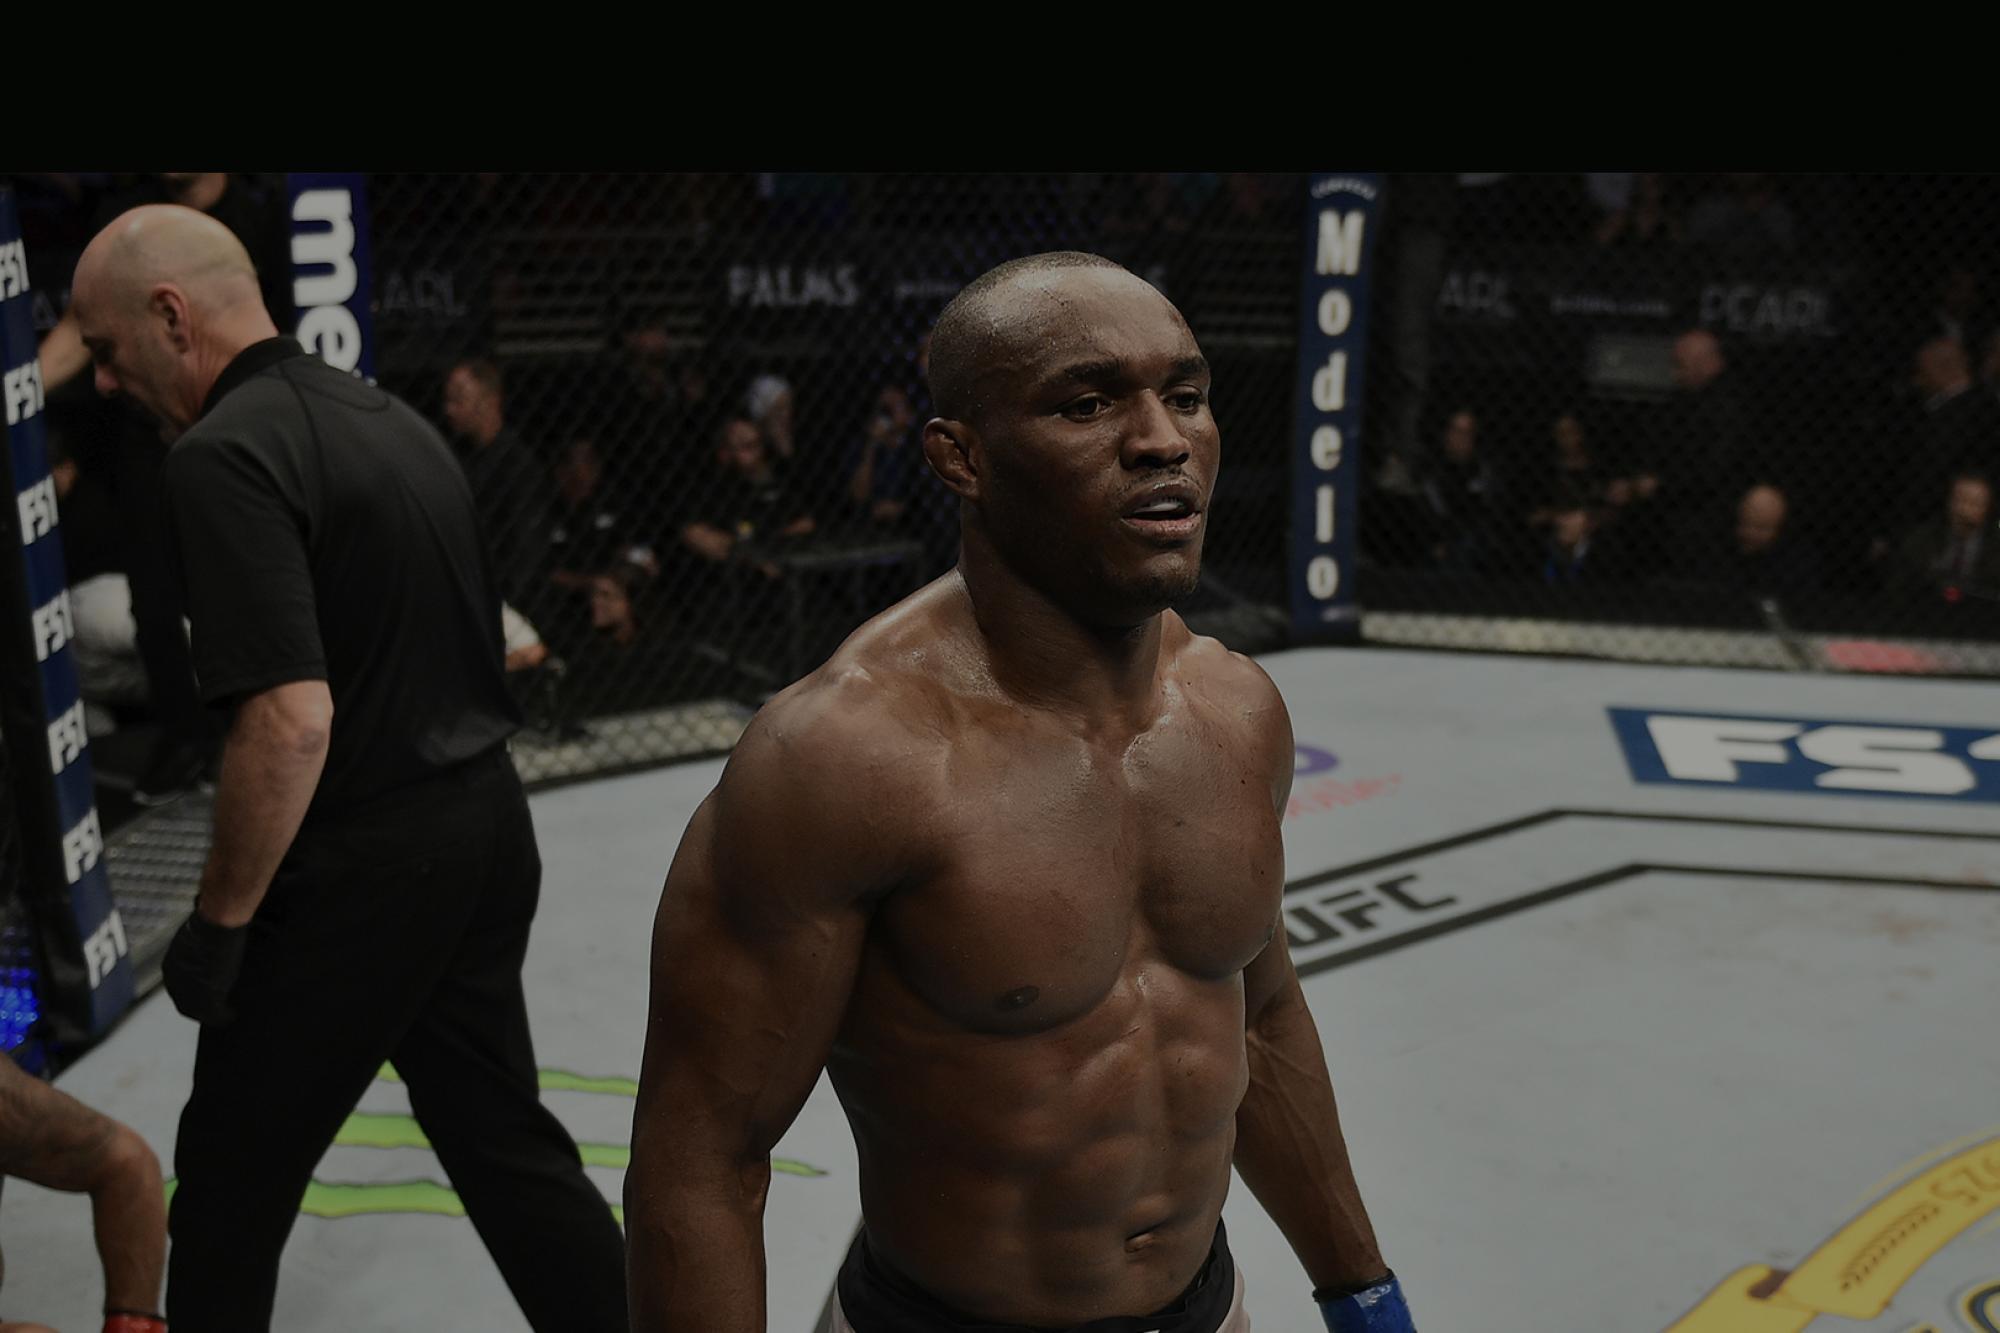 Kamaru Usman fires back at critics of his inactivity as Champion! - Kamaru Usman